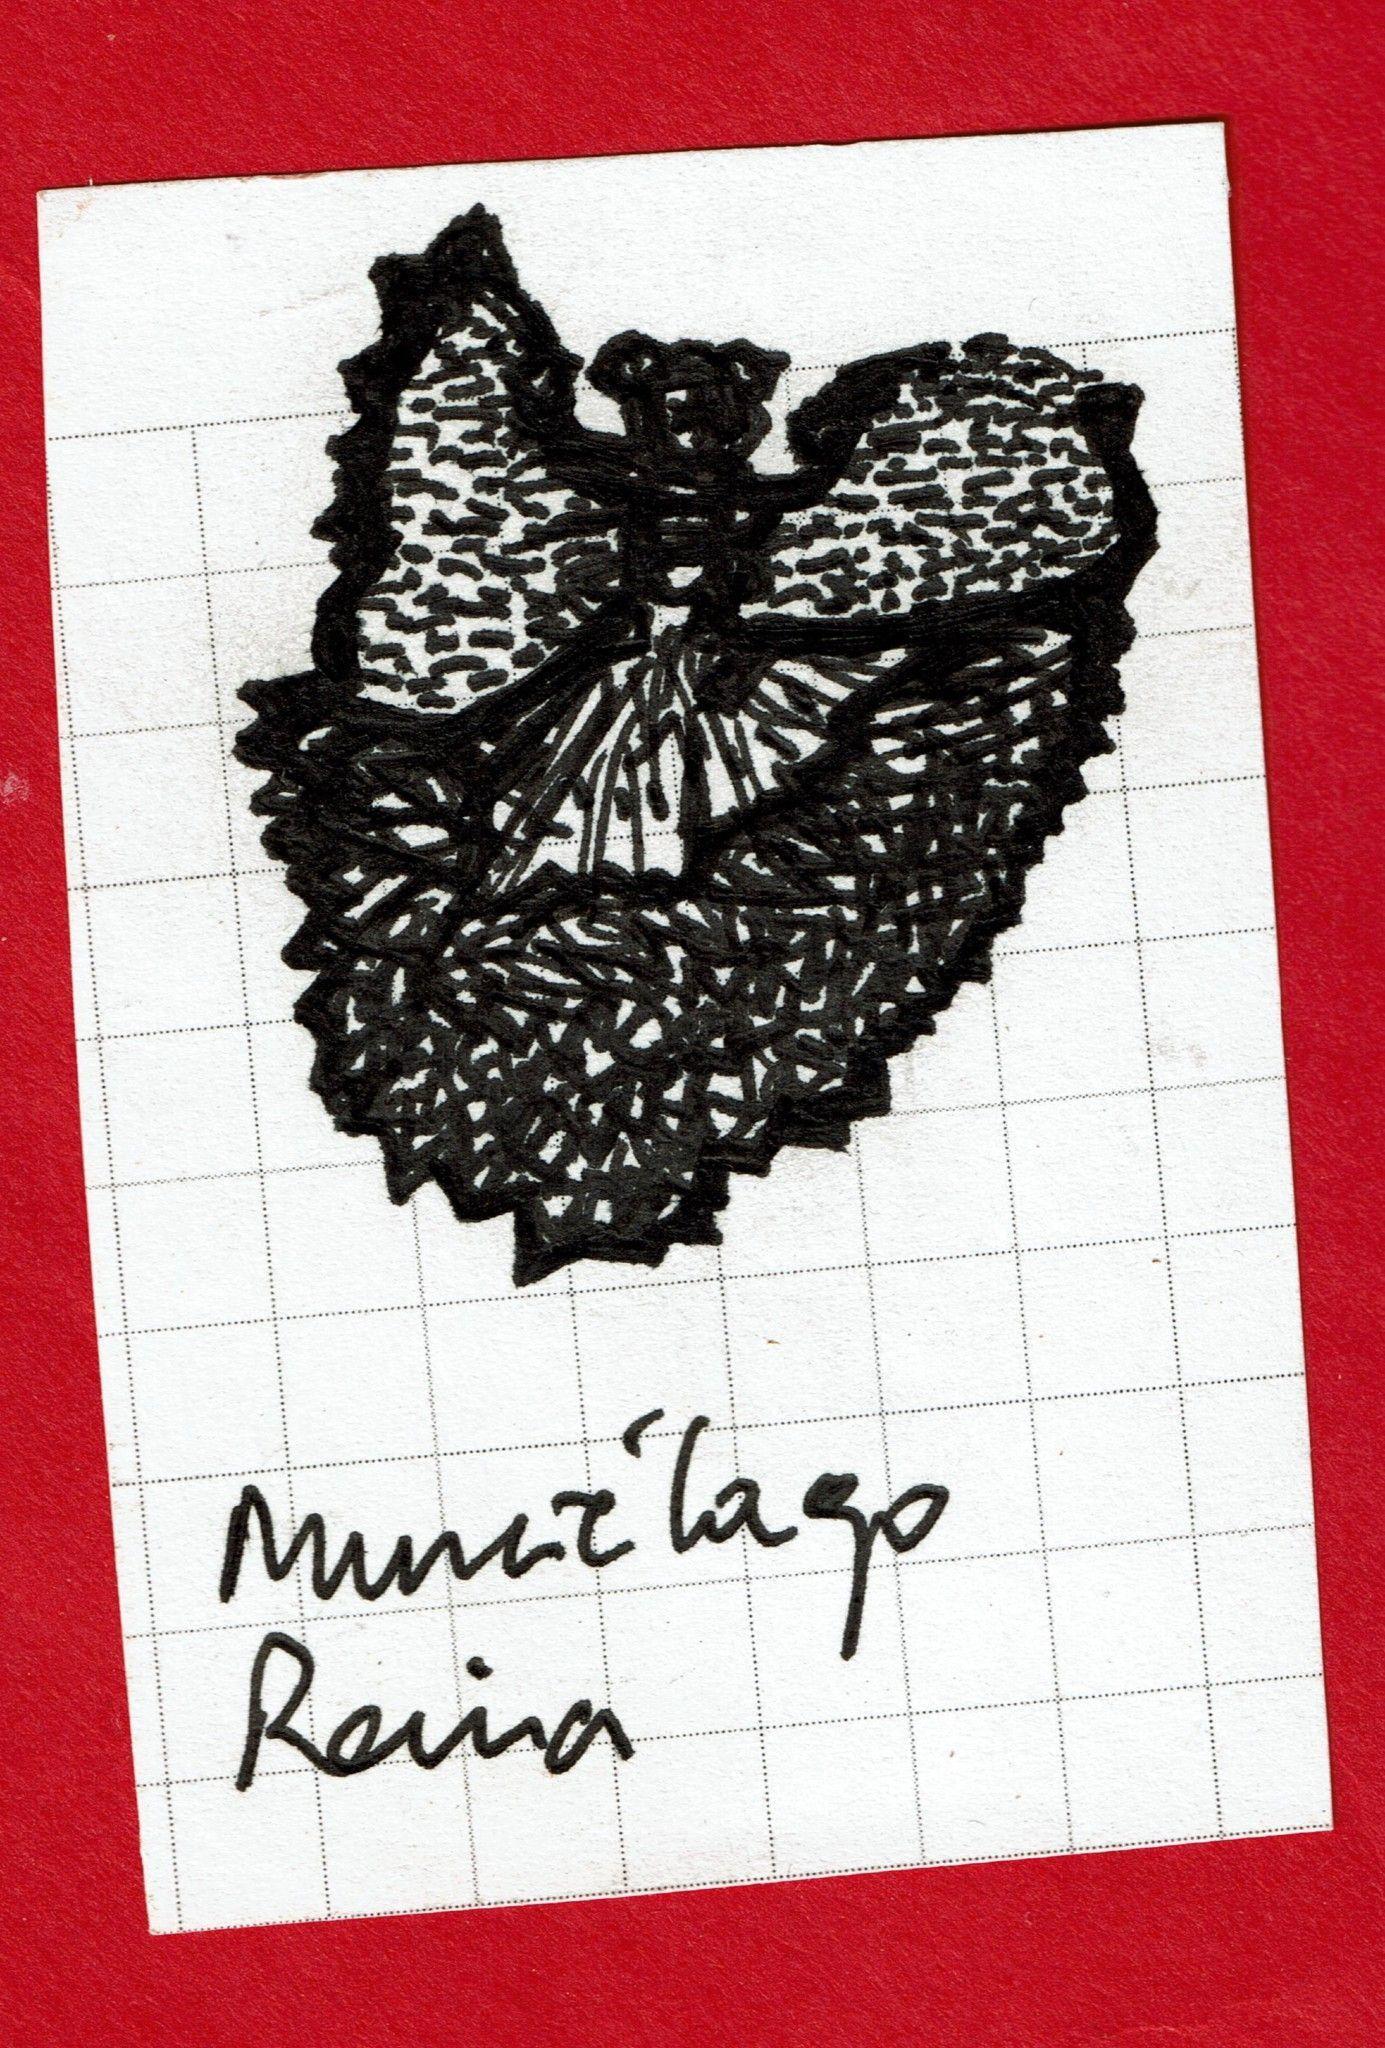 Murciélago Reina